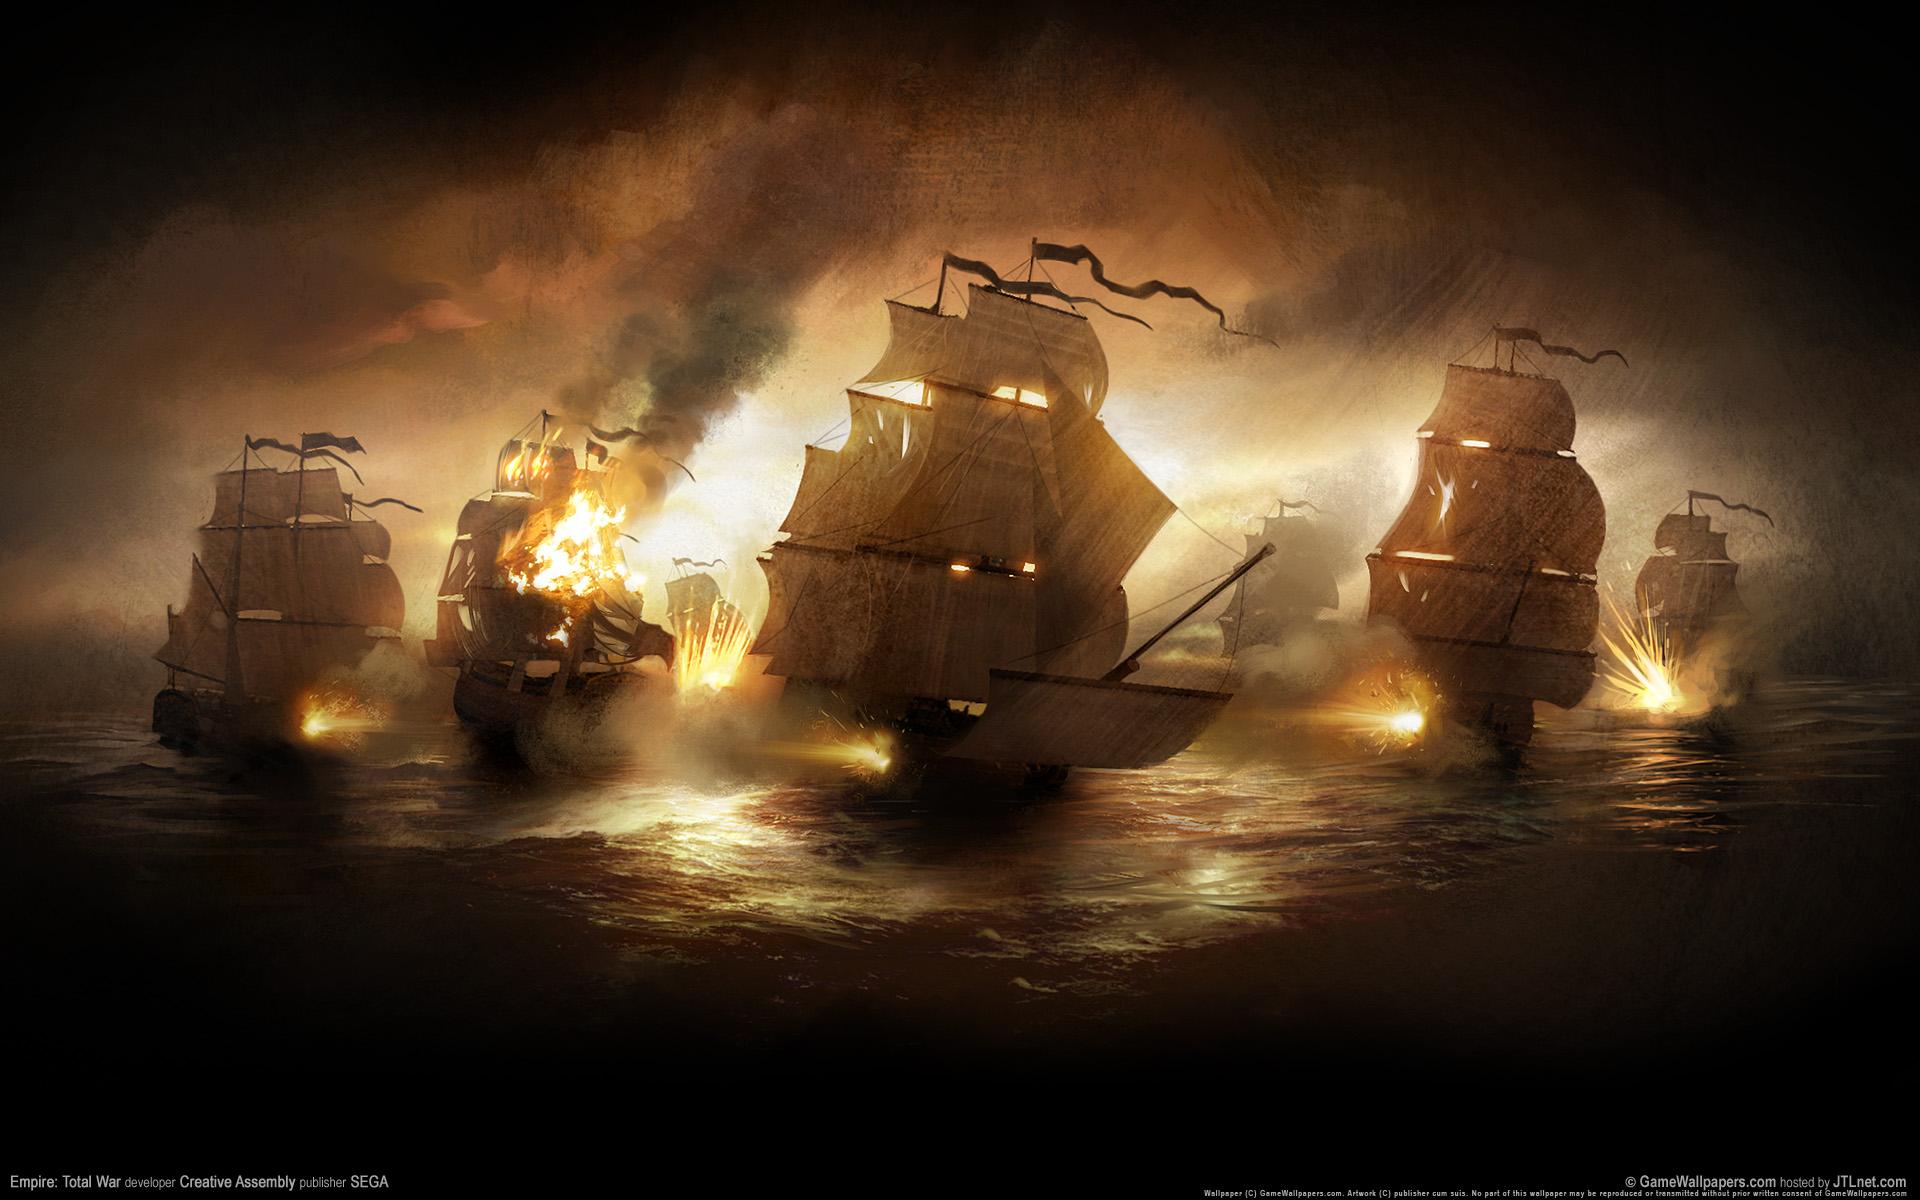 Empire Total War 3 Wallpapers HD Wallpapers 1920x1200